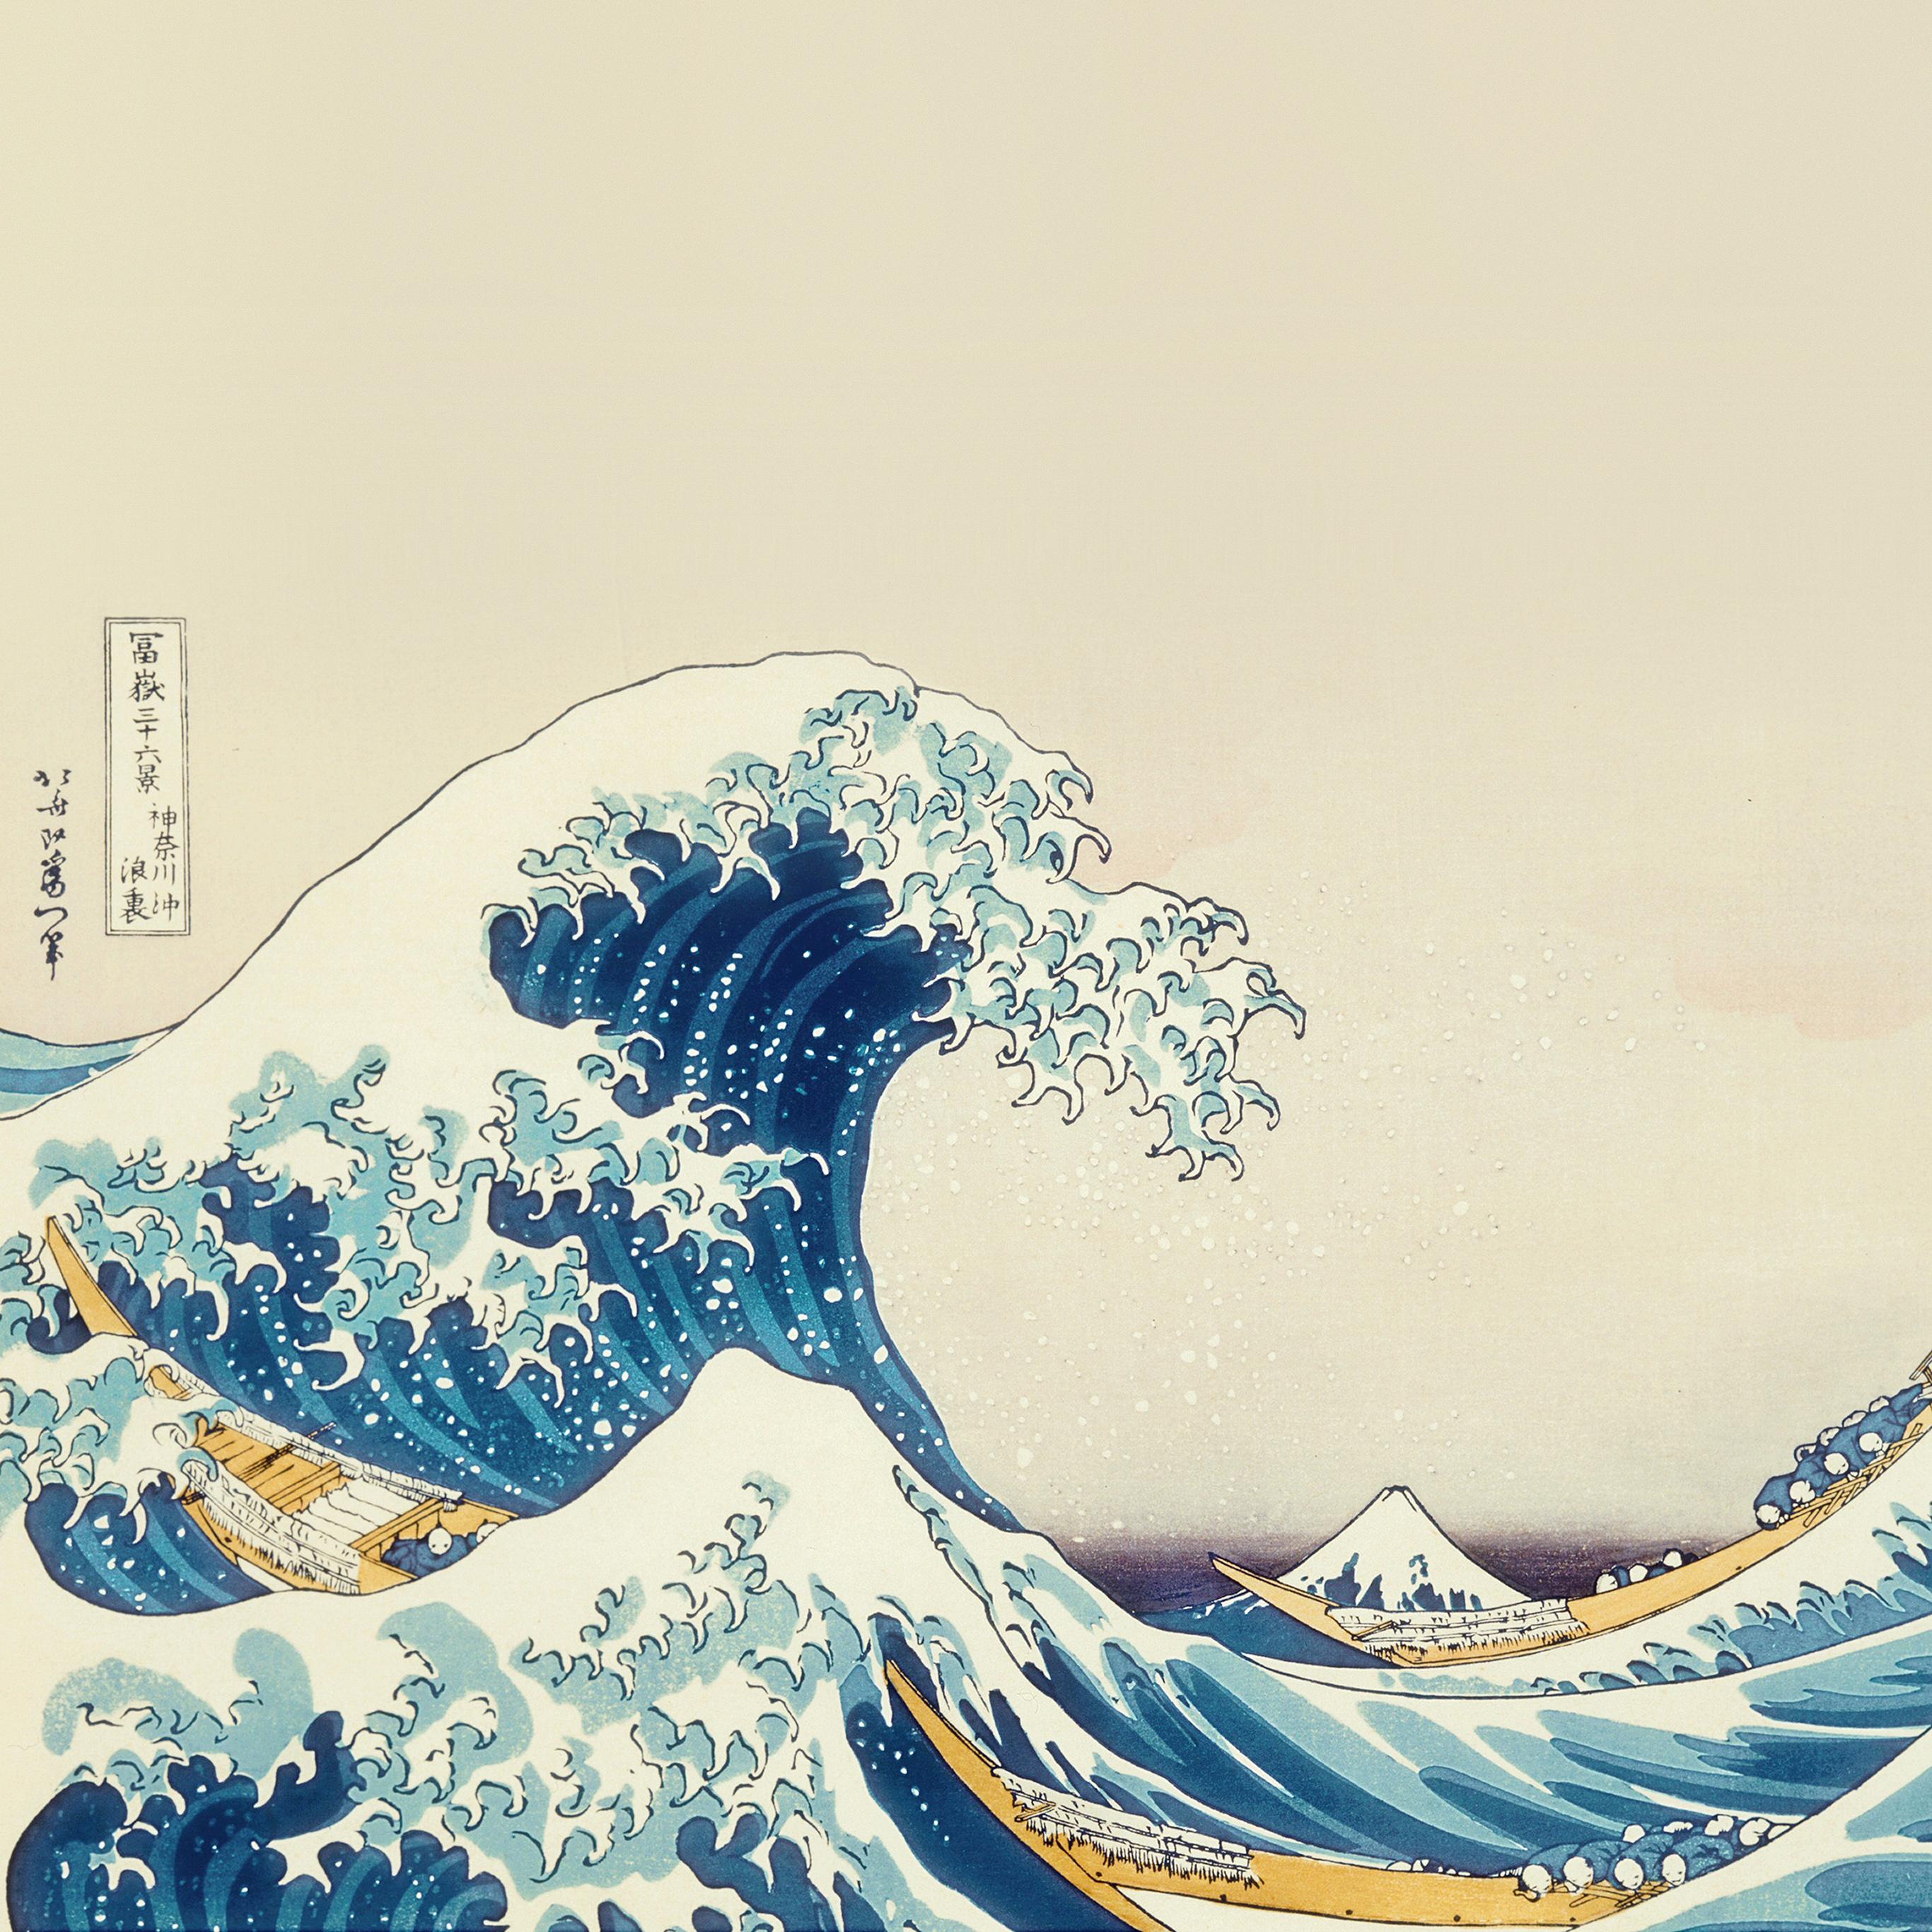 An25 wave art hokusai japanese paint illust classic papers ipad pro ipad retina gumiabroncs Image collections